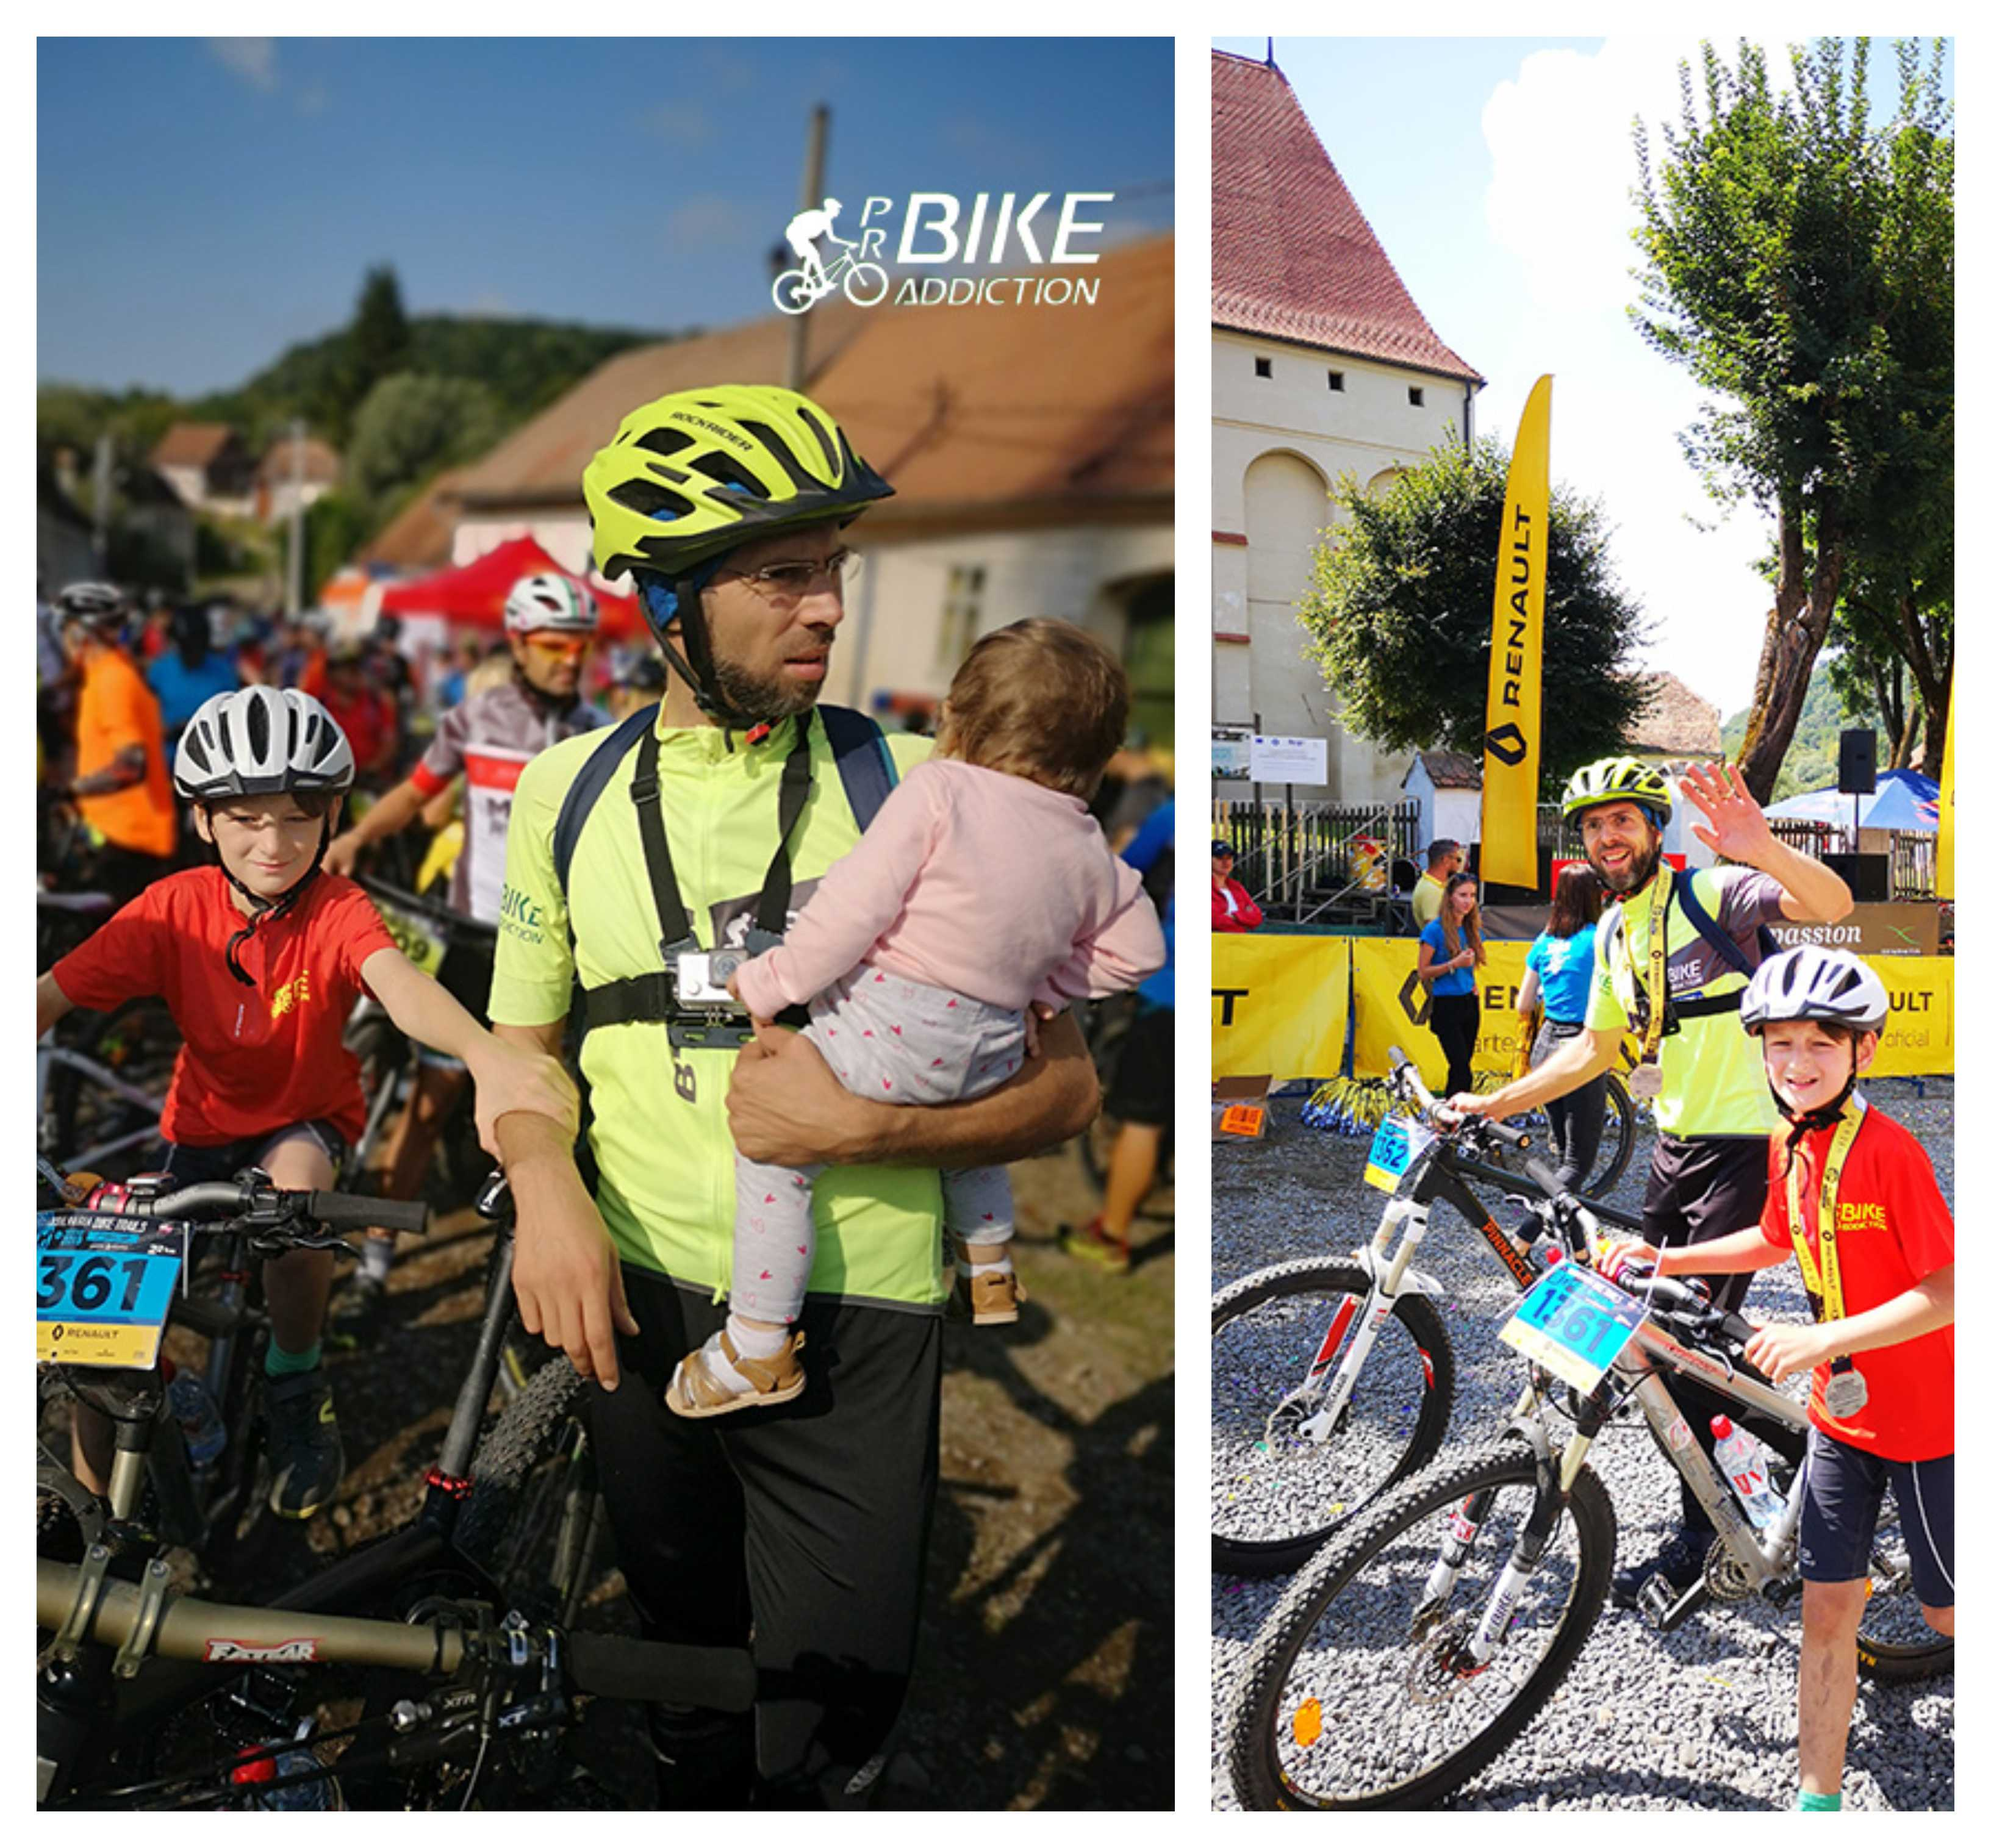 probikeaddiction transilvania bike trails